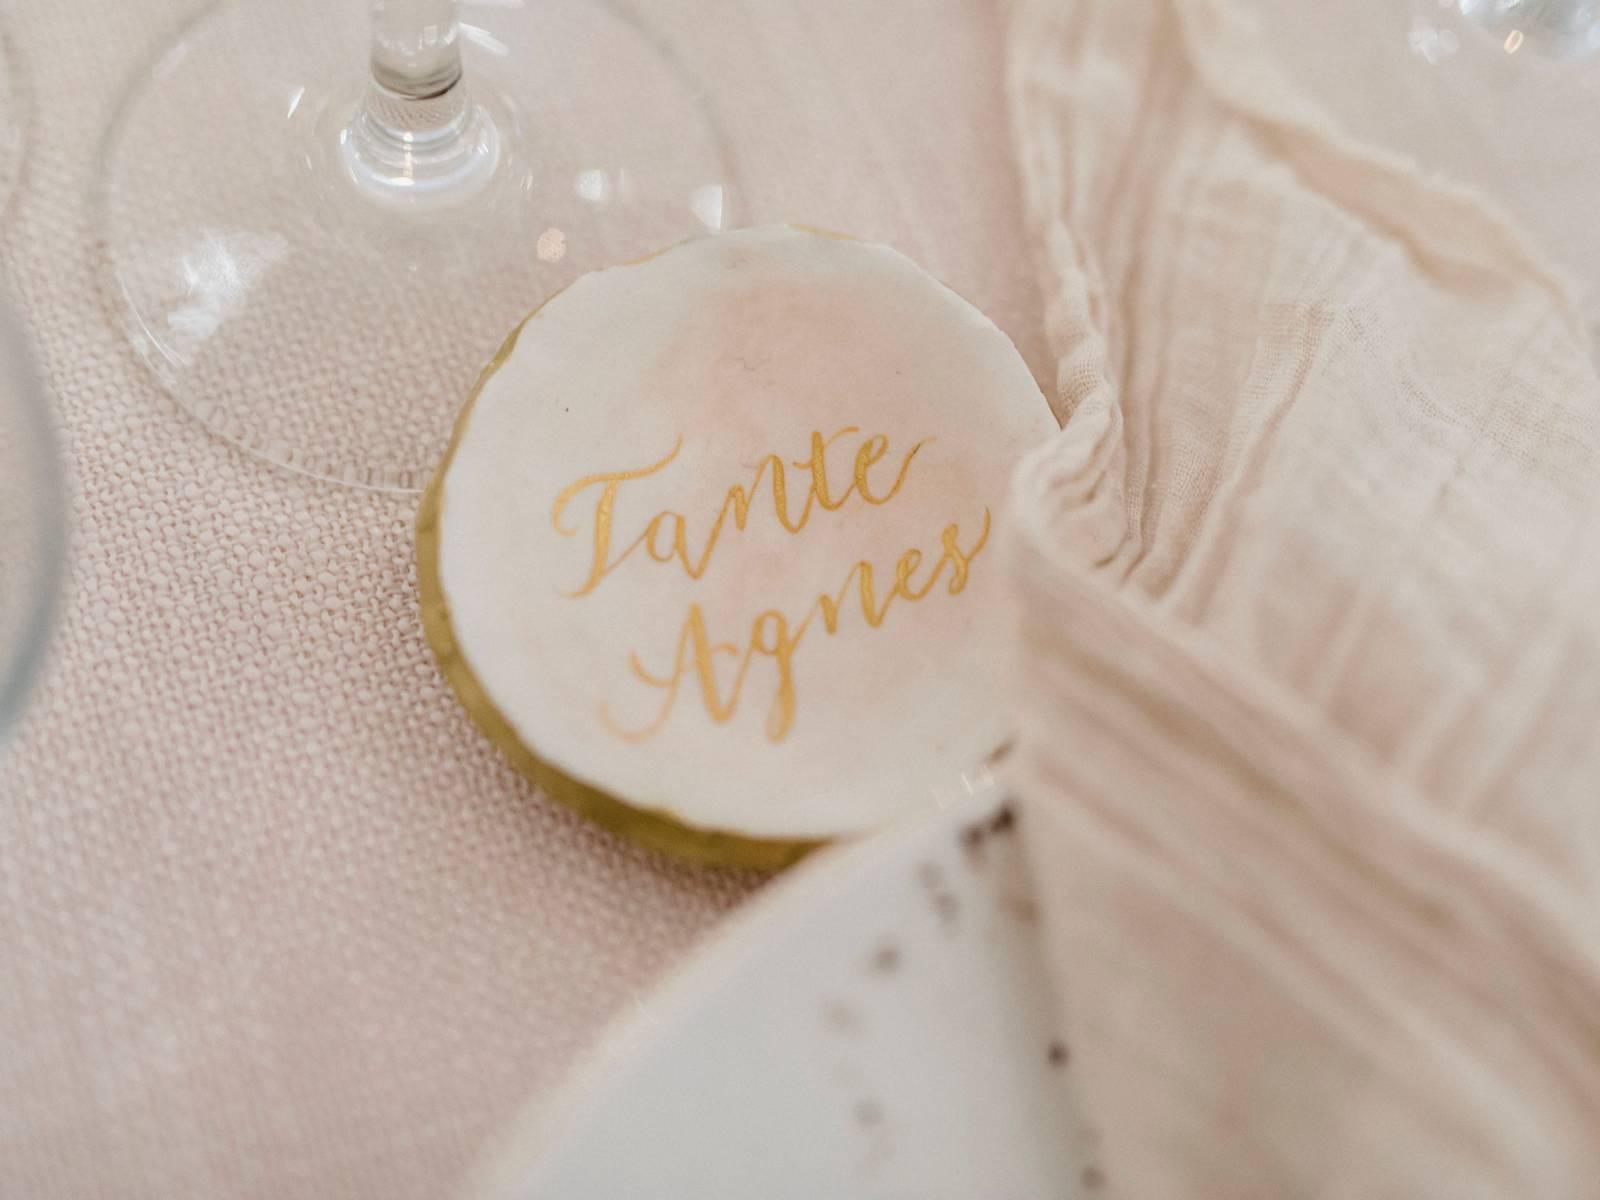 Touch of Gold - Workshops - Vrijgezellen - Trouwuitnodiging - Huwelijksuitnodiging - Kalligrafie - House of Weddings - 7